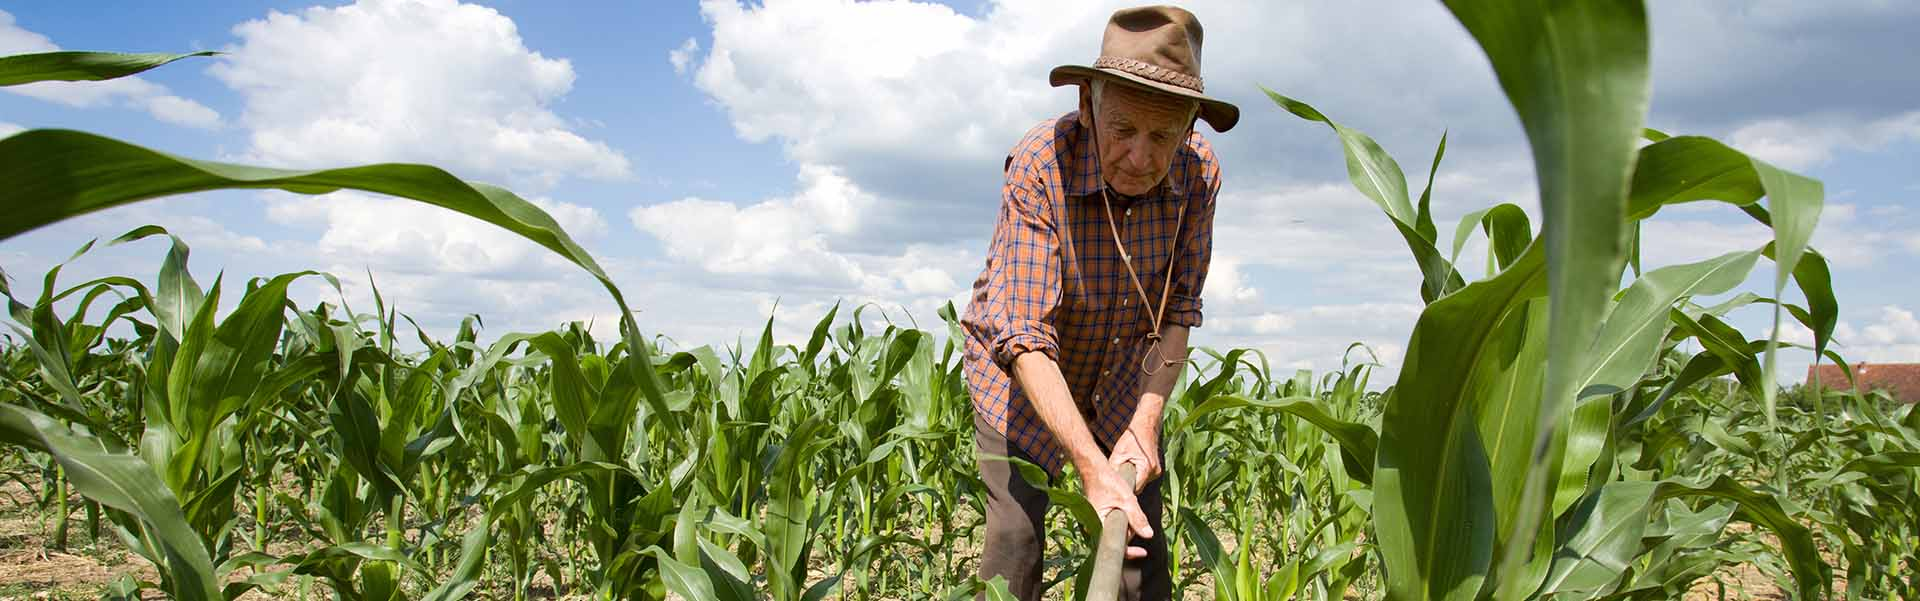 crops-1920x600.jpg